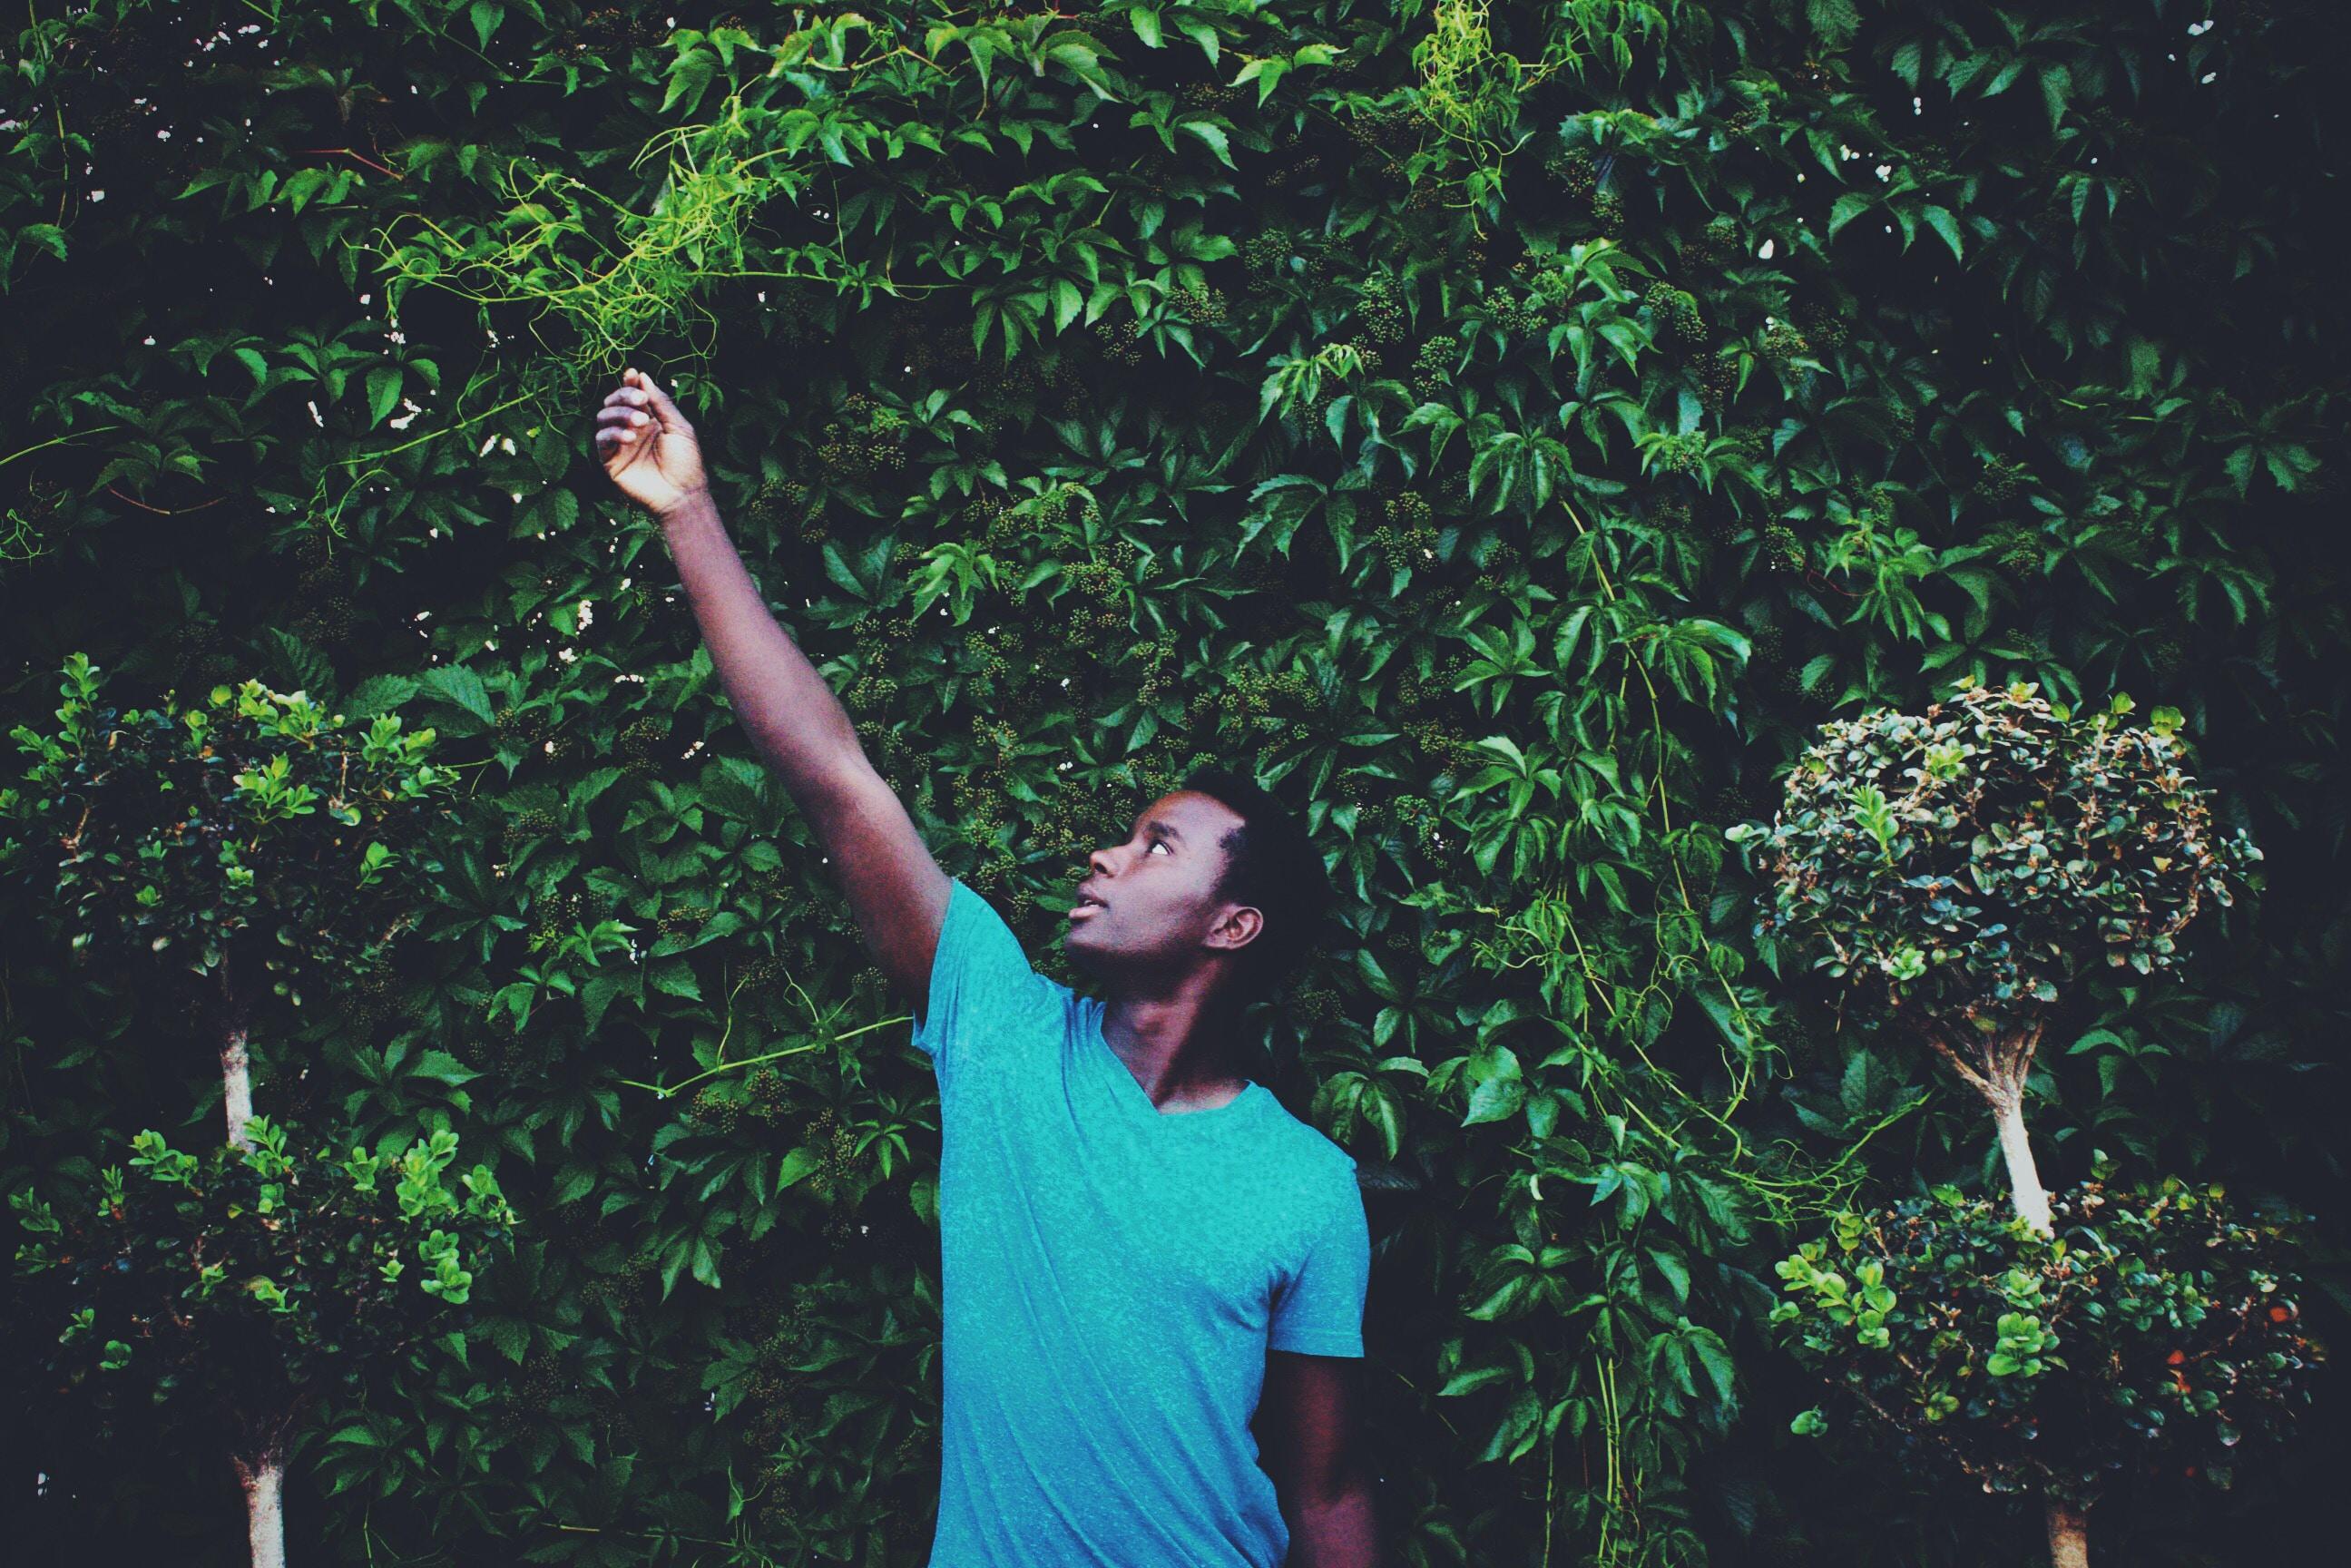 man standing while reaching leaf during daytime